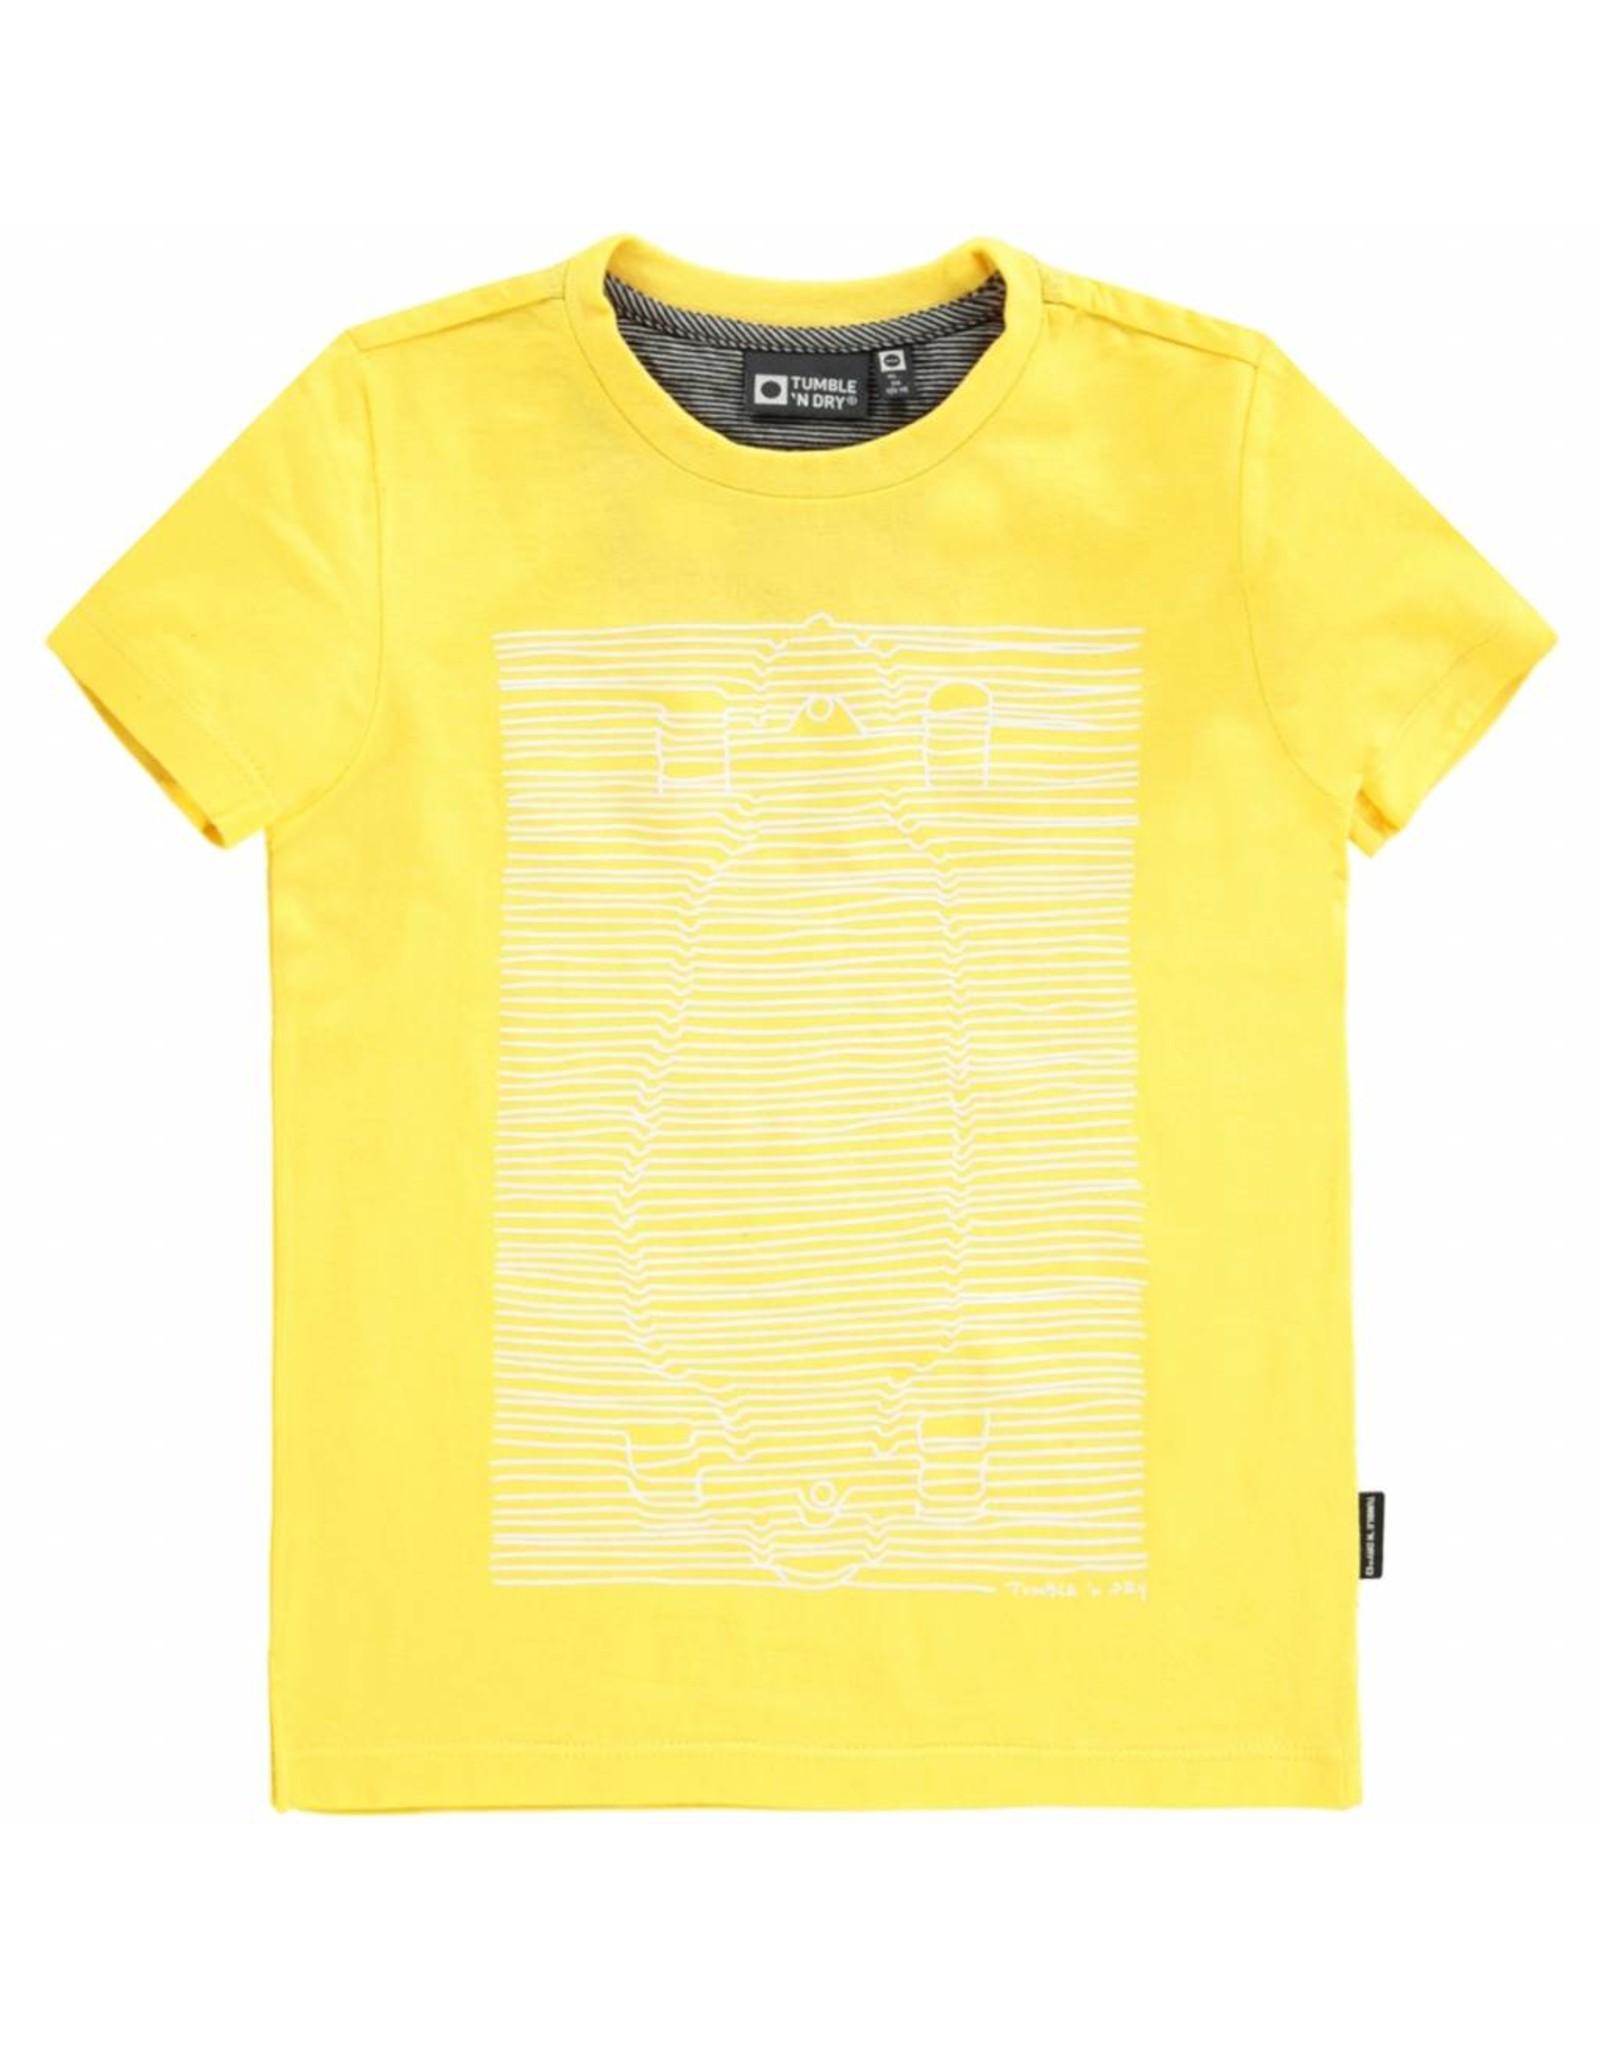 TUMBLE 'N DRY Tumble 'N Dry Boys Mid - Donny yellow